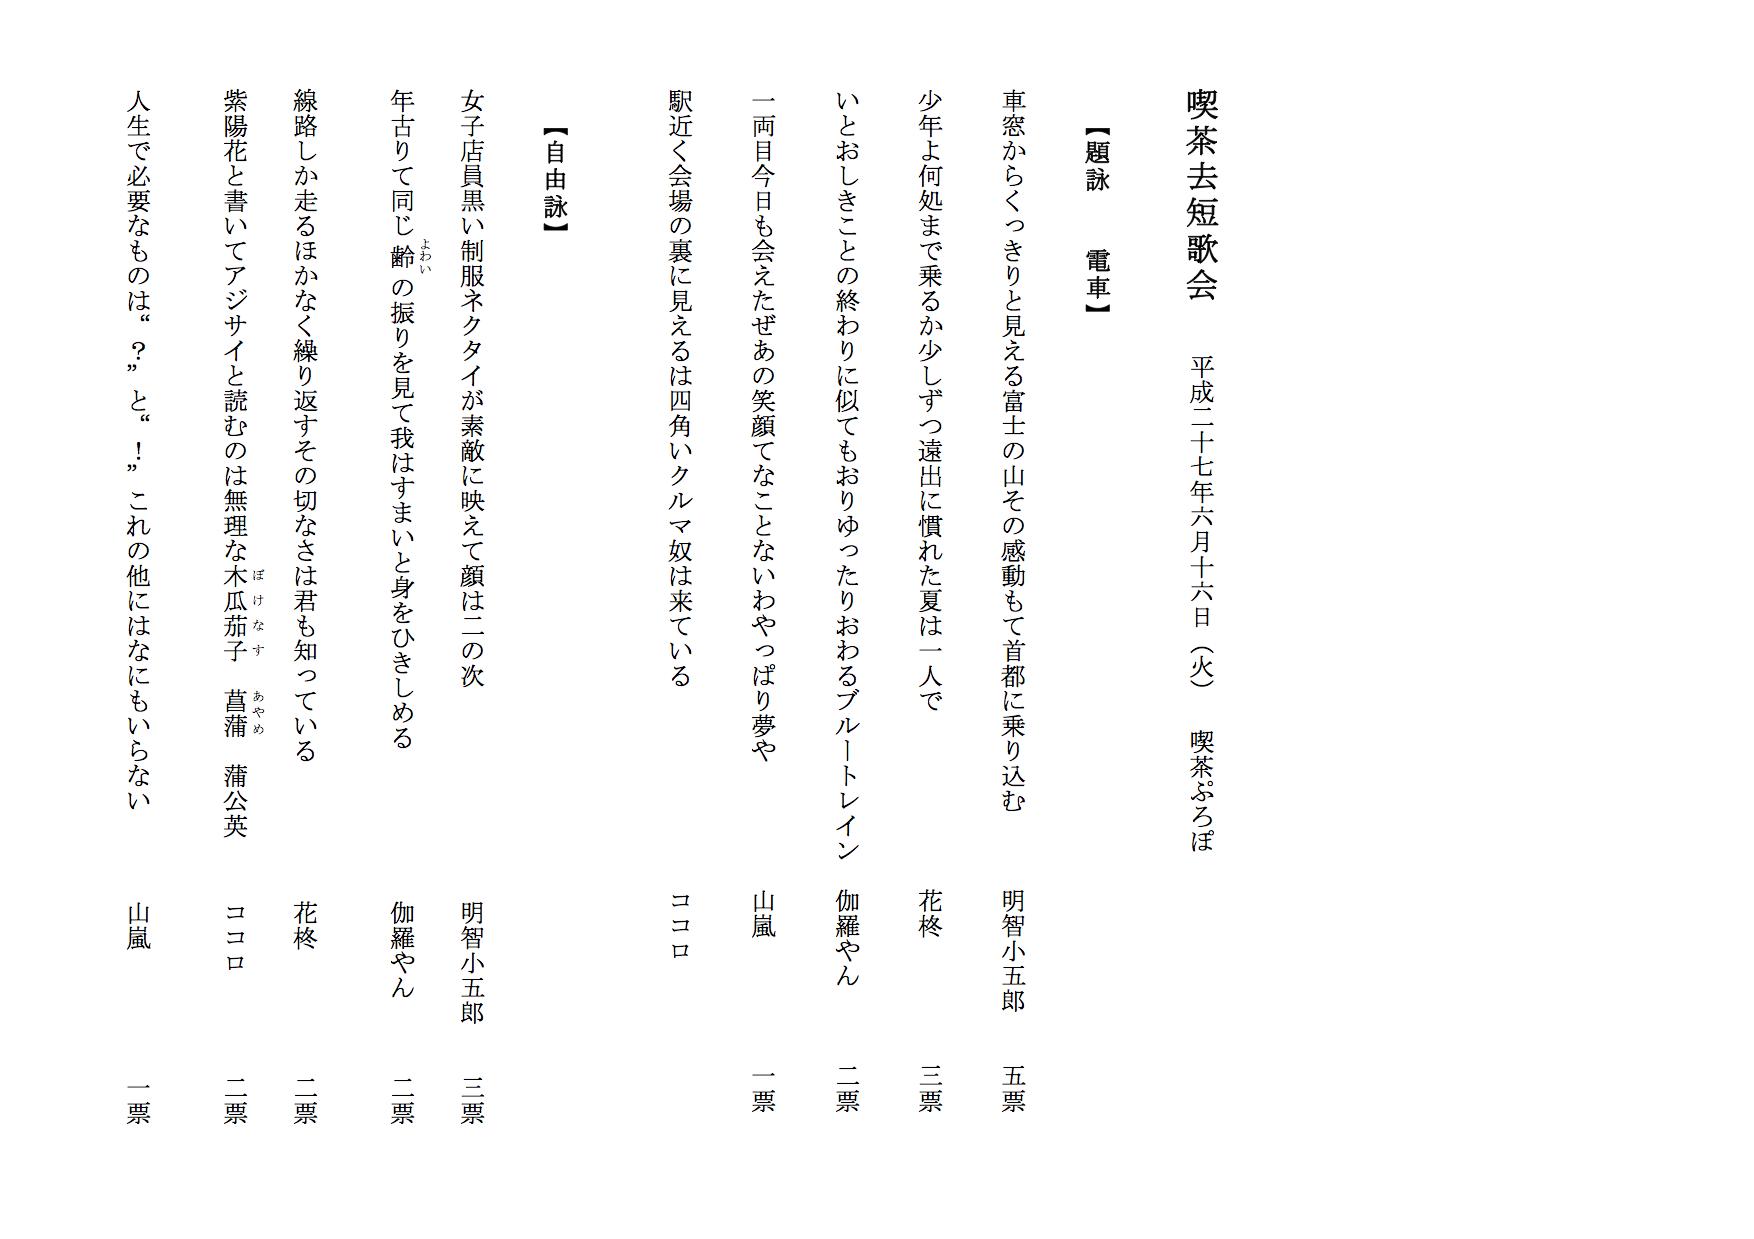 01506 喫茶去短歌会  平成二十七年六月十六日(火) 喫茶ぷろぽ